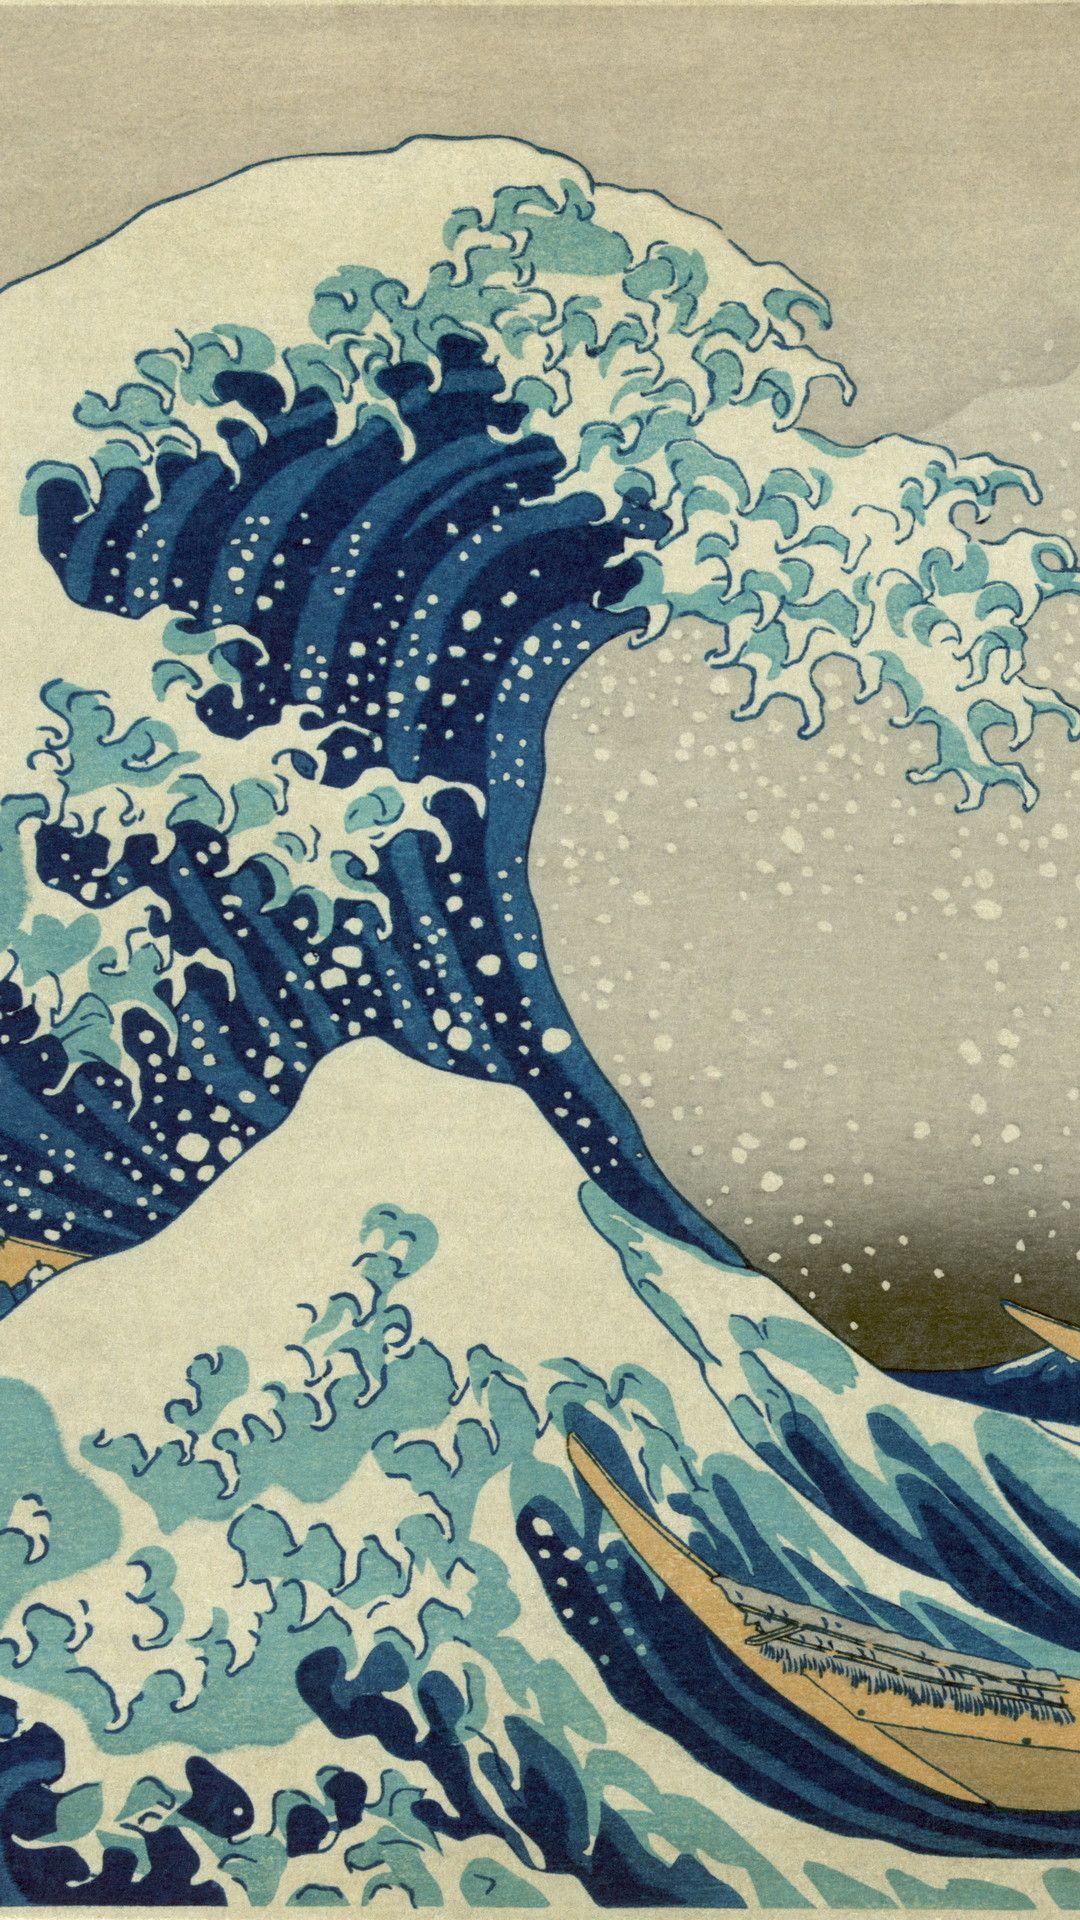 Katsushika Hokusai Japan art iPhone wallpapers iPhone 1080x1920